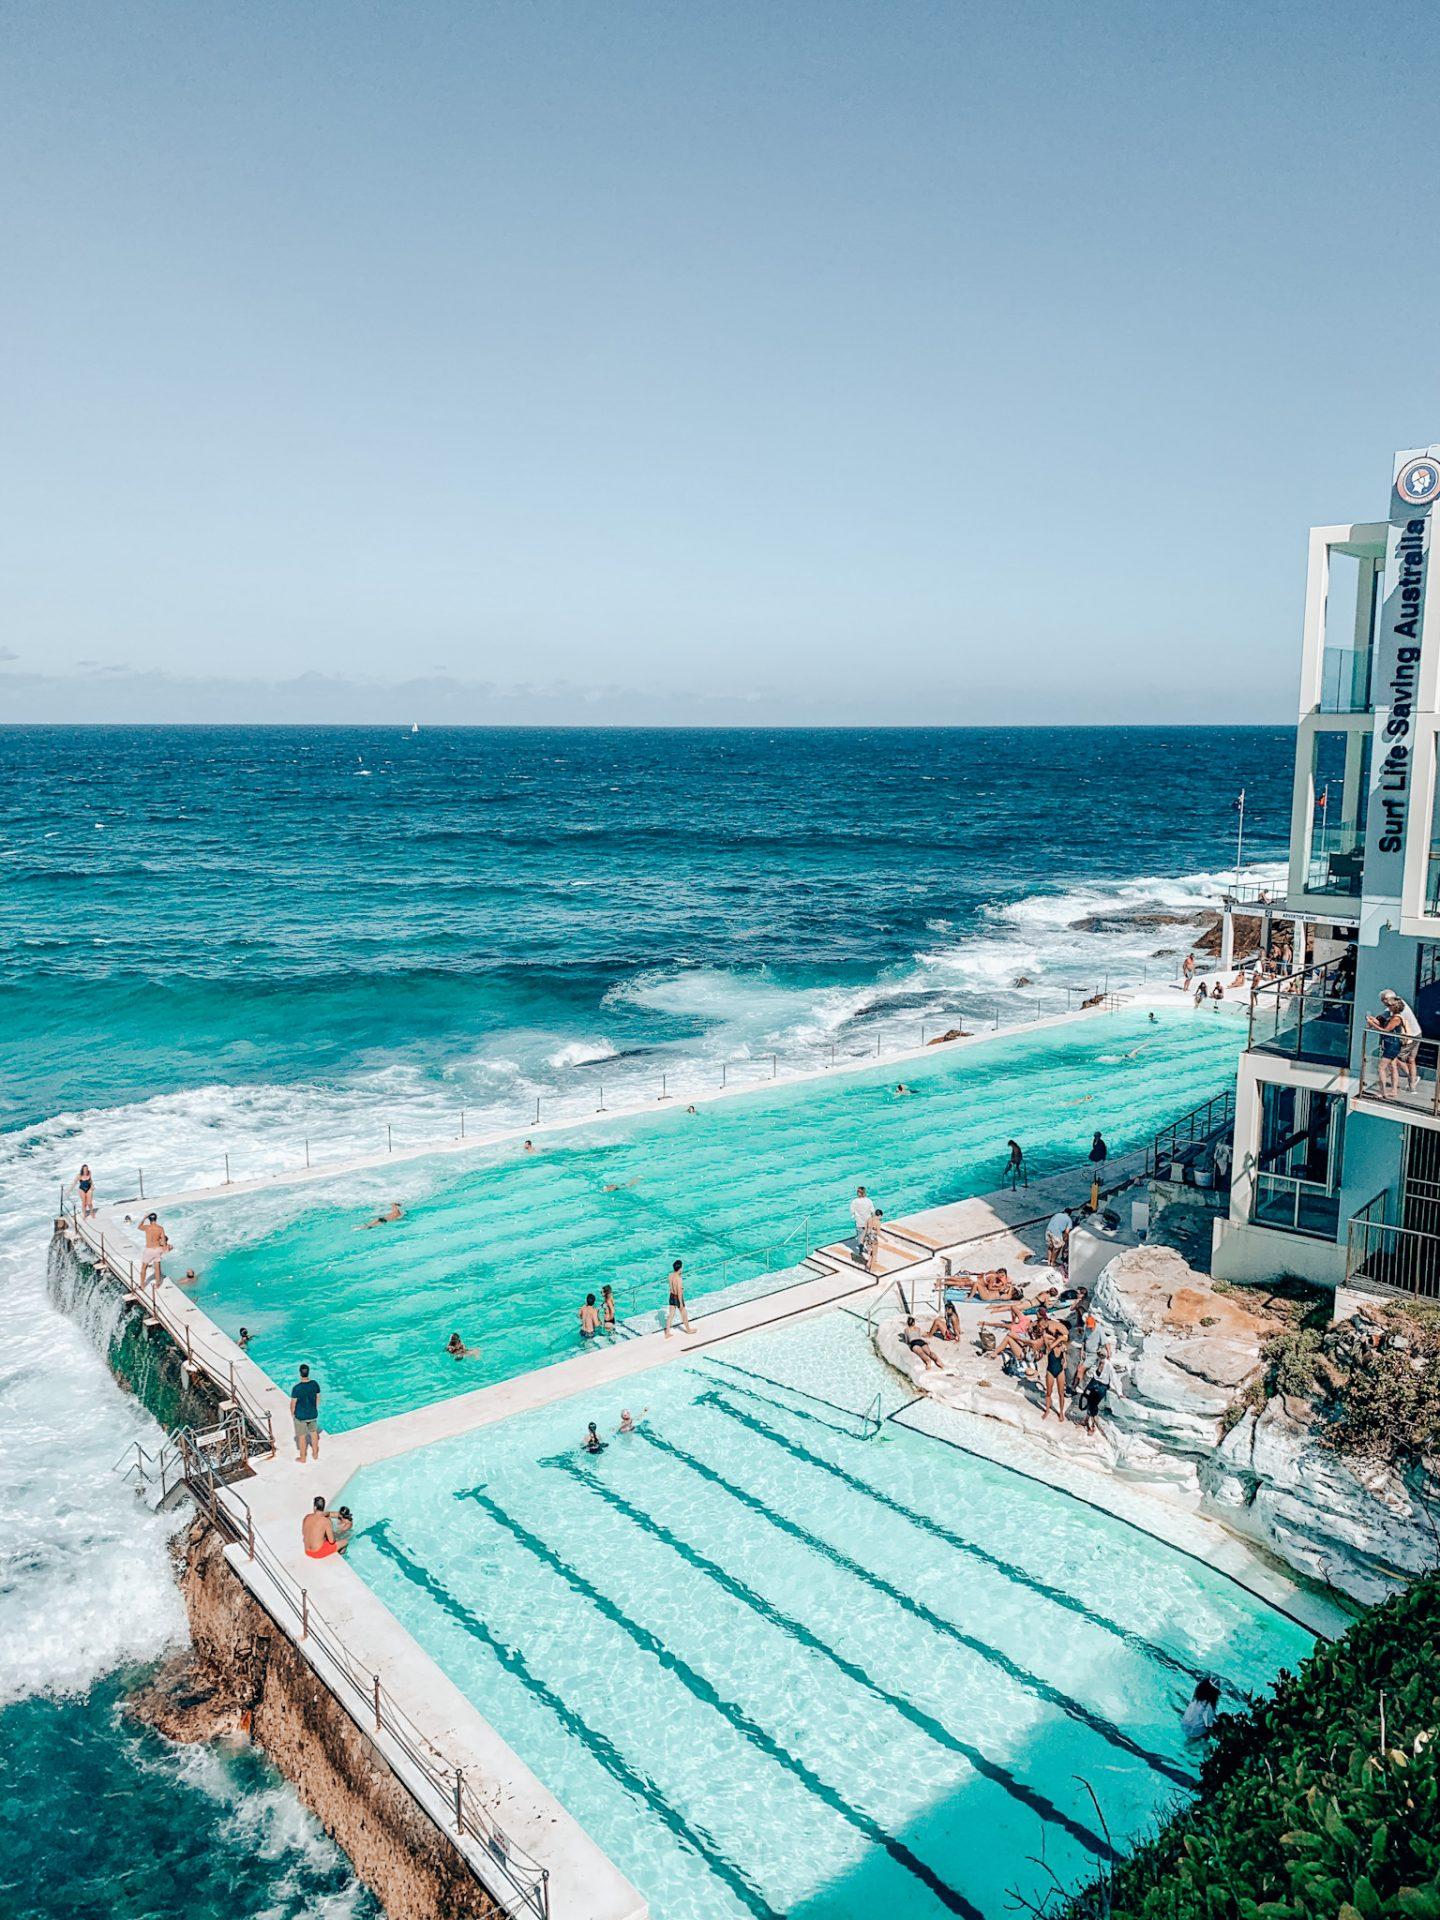 Photo of the blue Bondi iceberg pools with ocean in background in Sydney, Australia